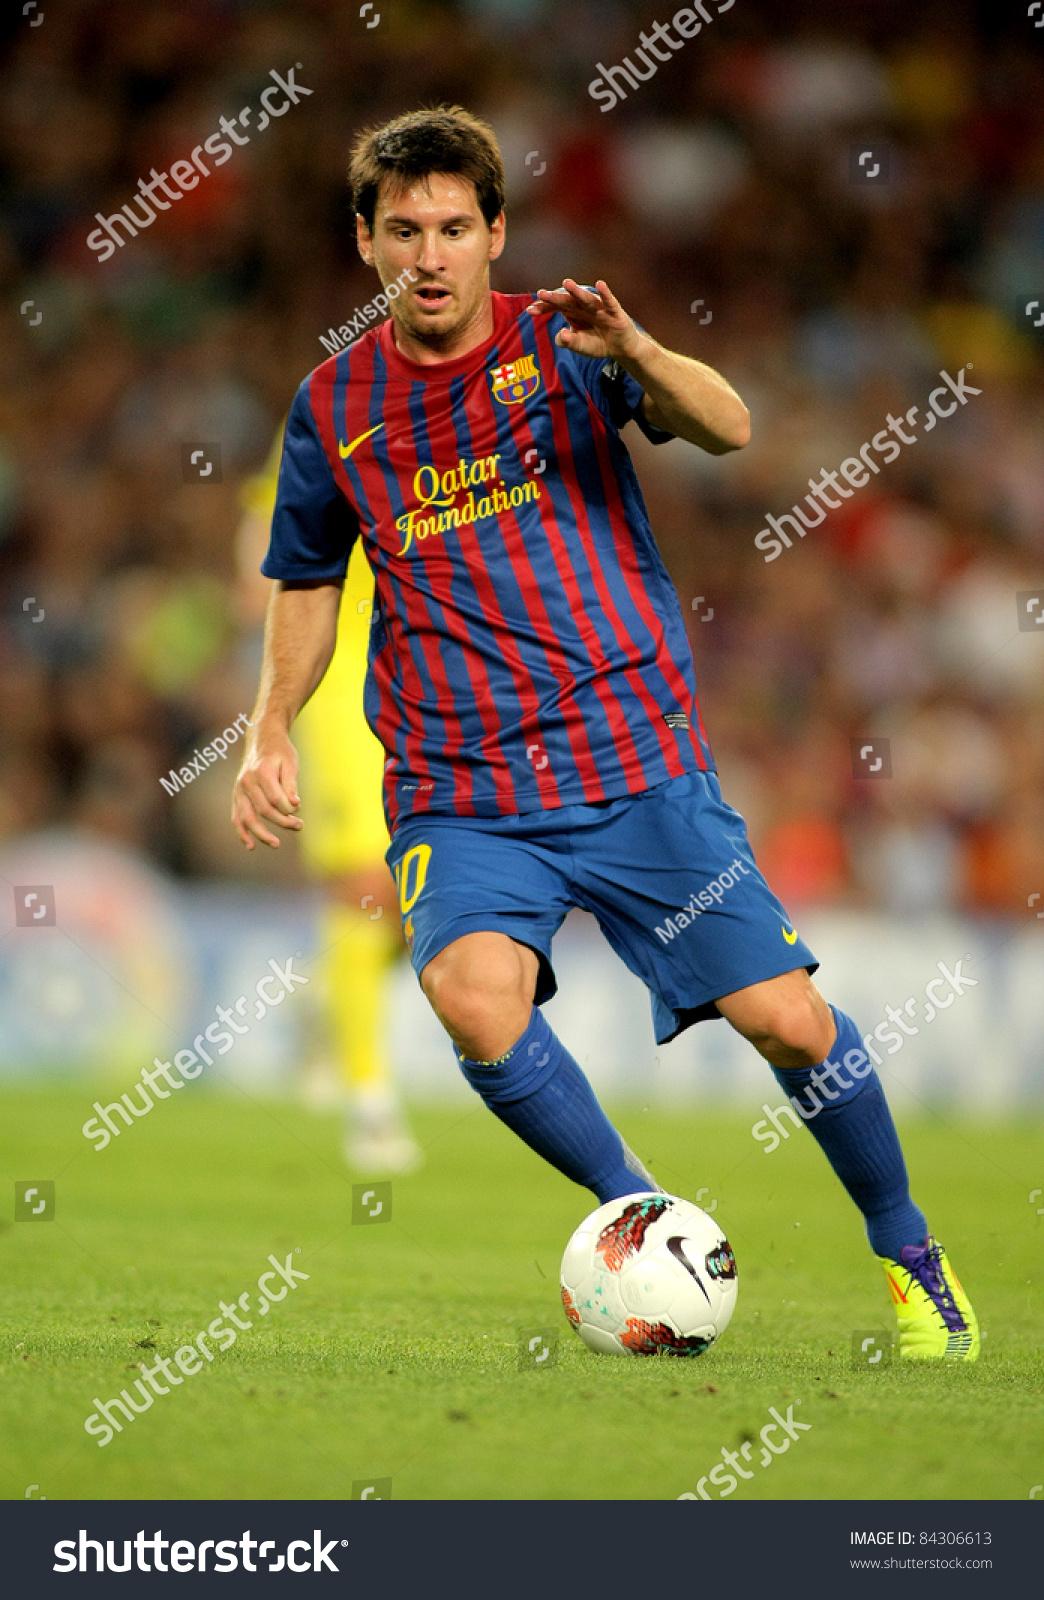 spanish match